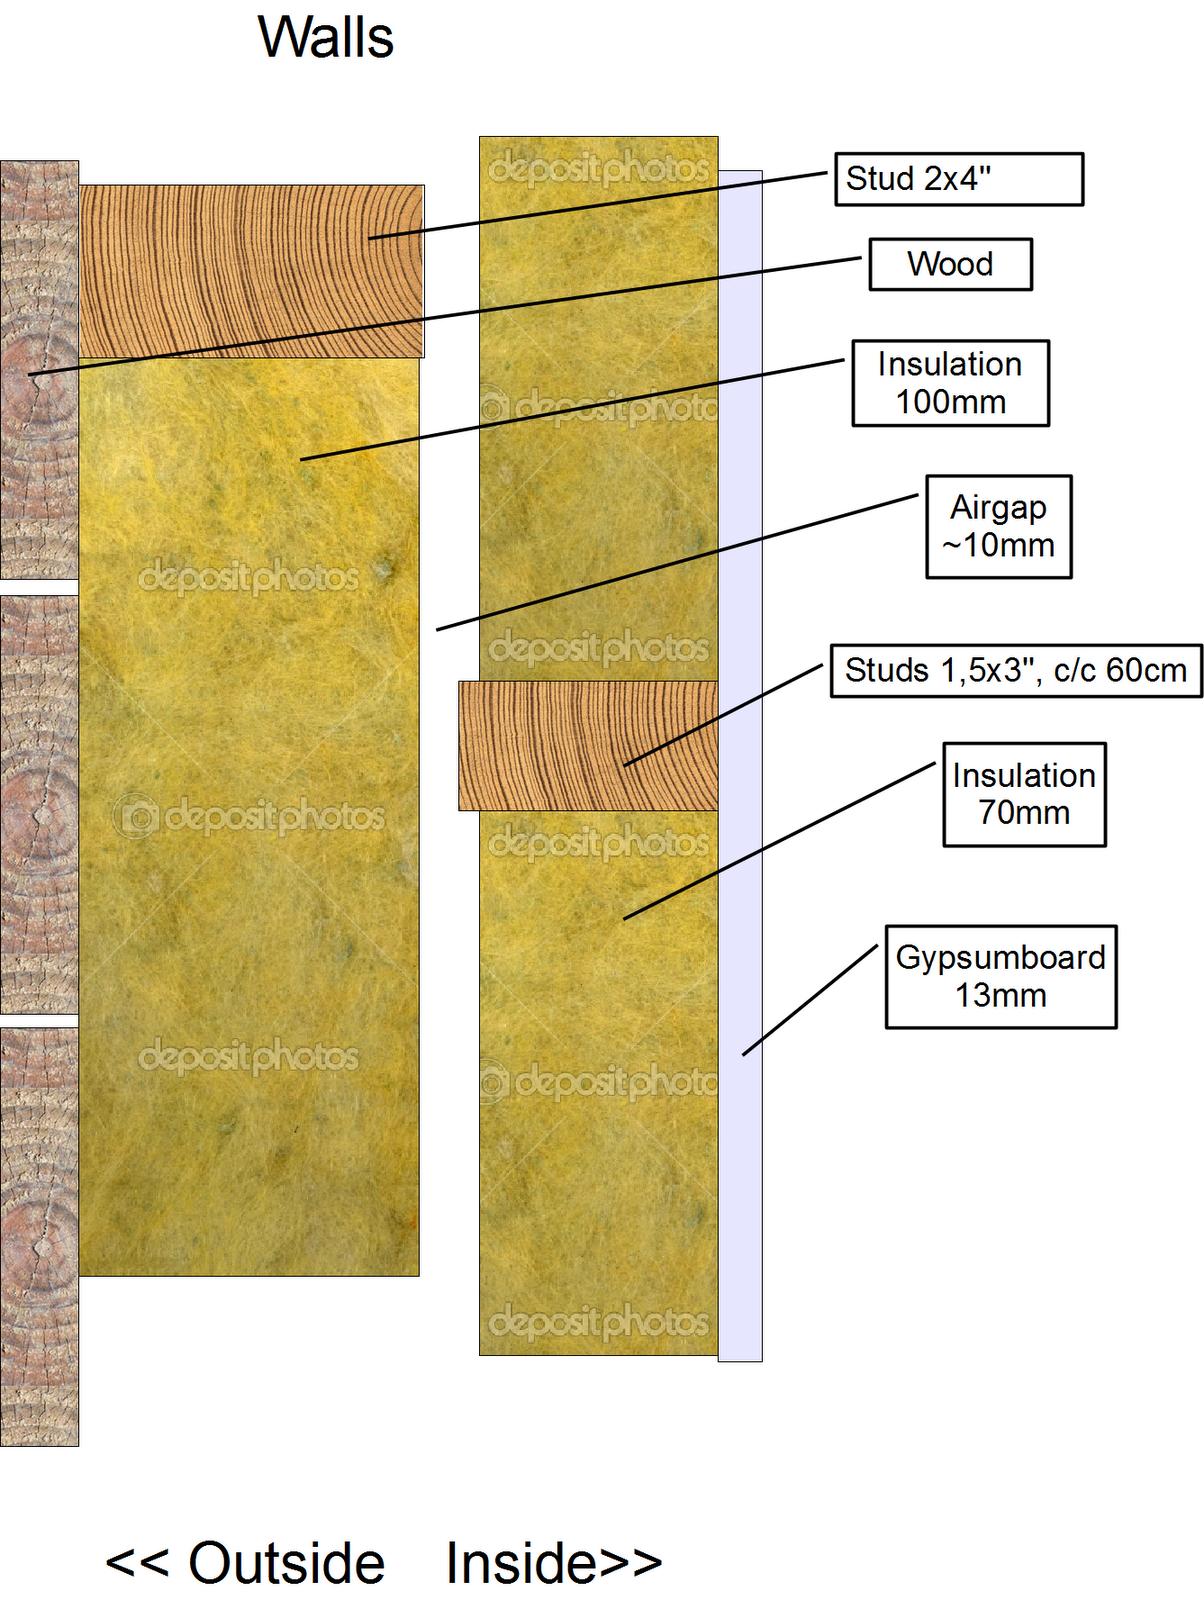 Geir's audio blog: Building a small studio - Part 3: Floor ...